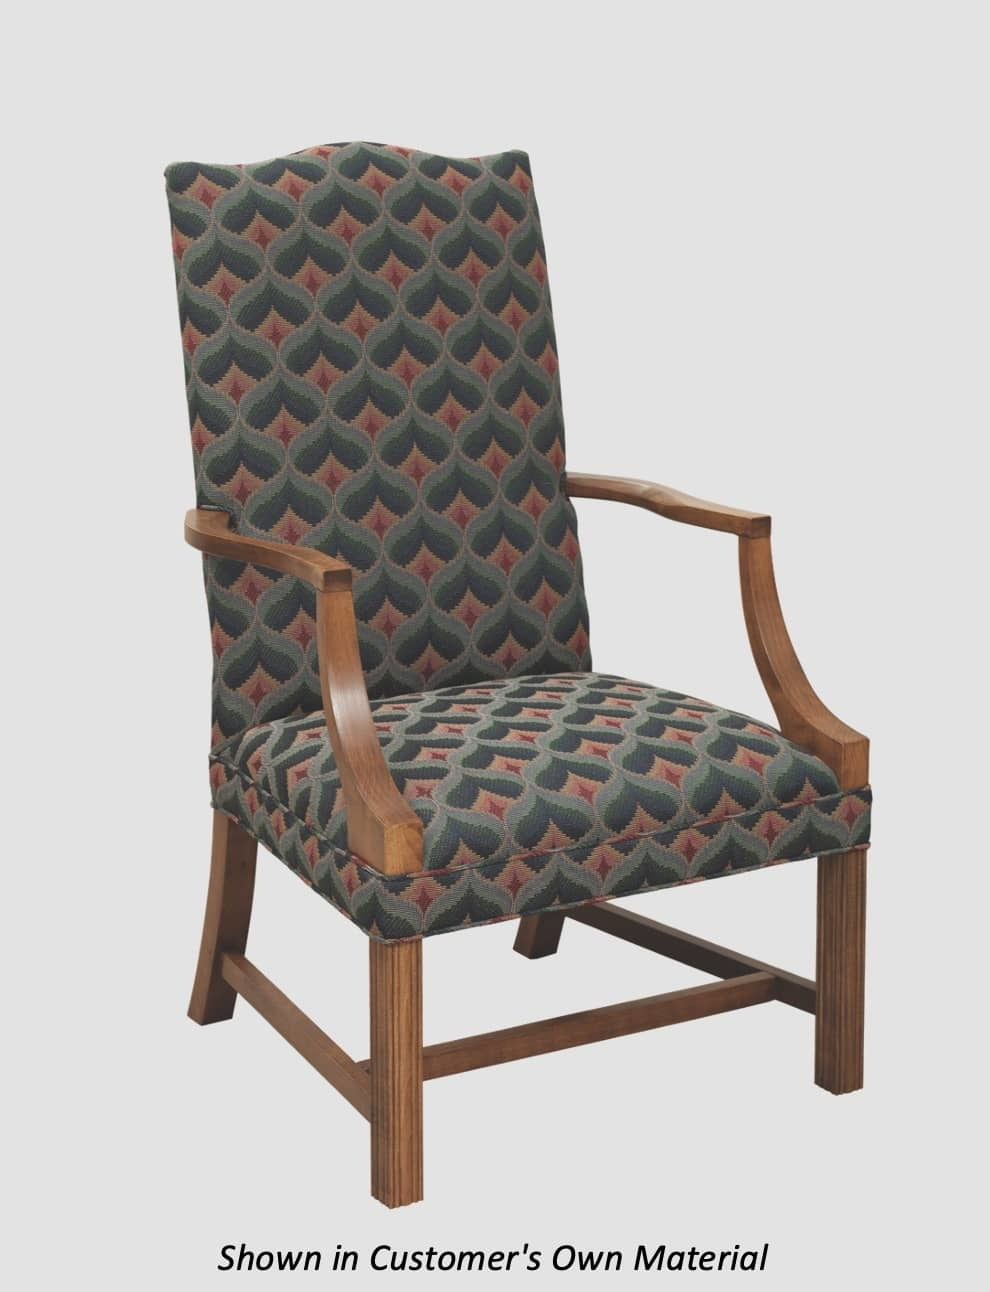 Town & Country Furnishings Martha Washington Chair